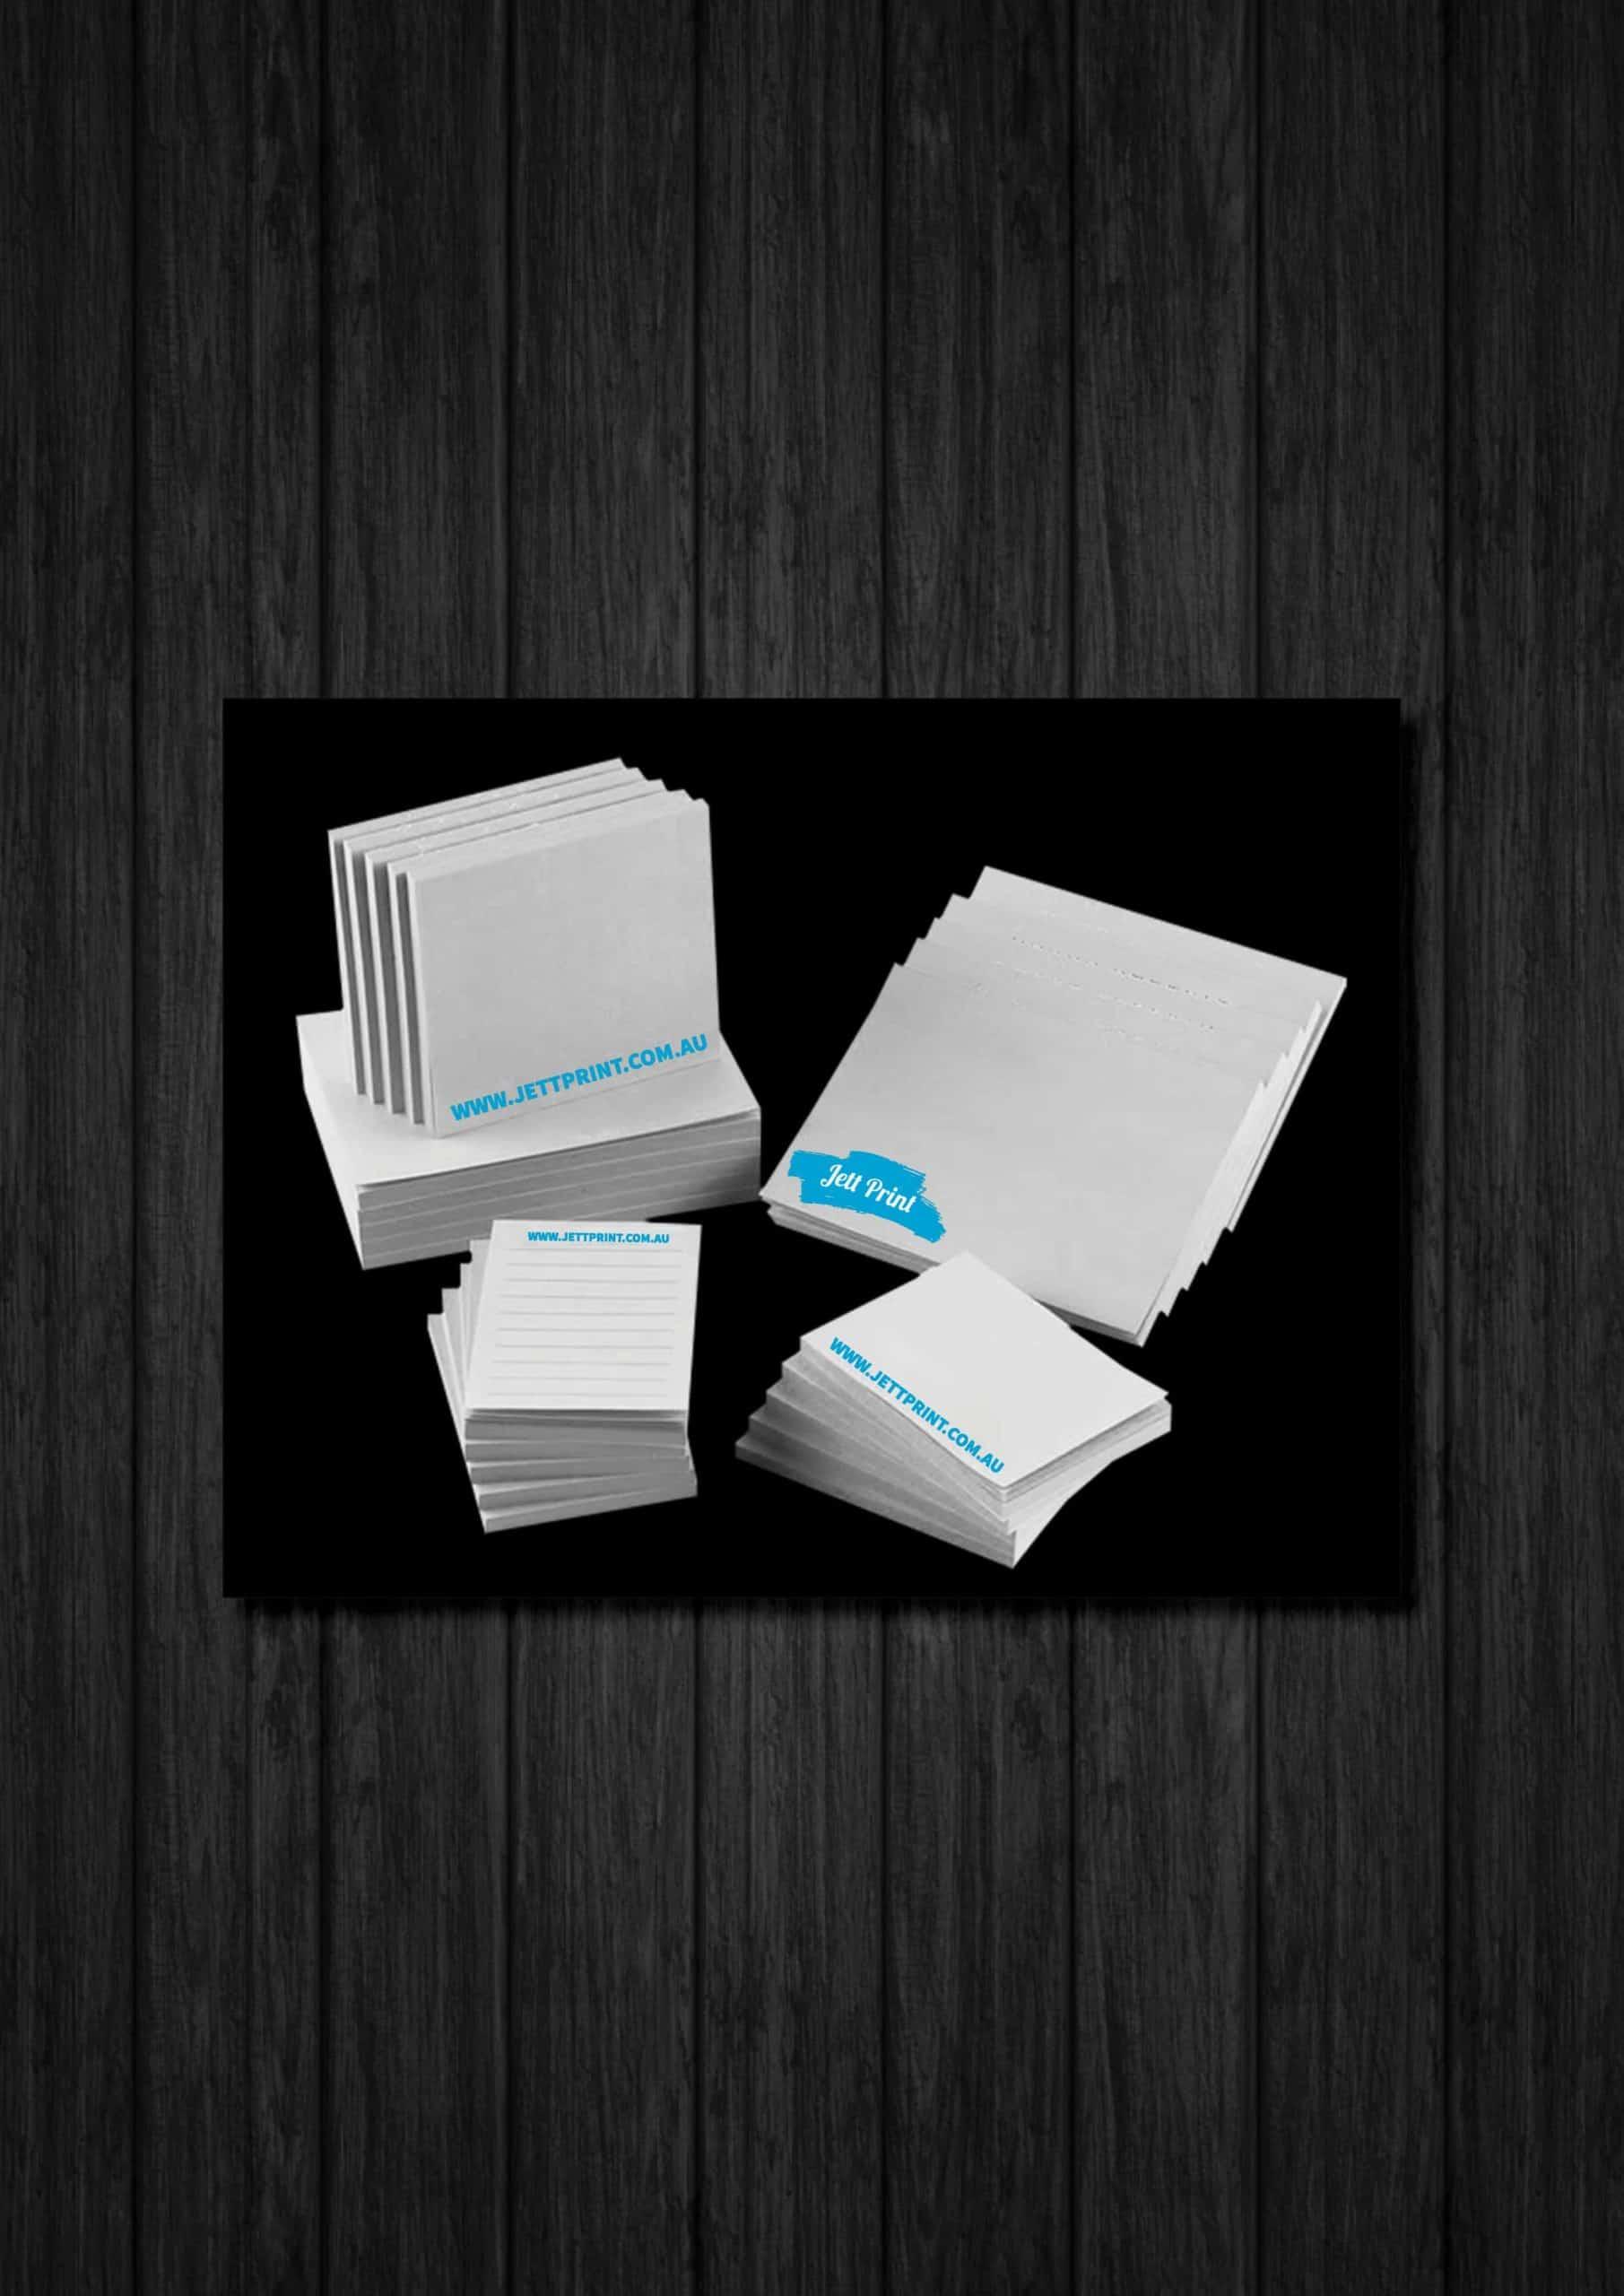 jett-print-custom-printed-sticky-pads-post-it-notes